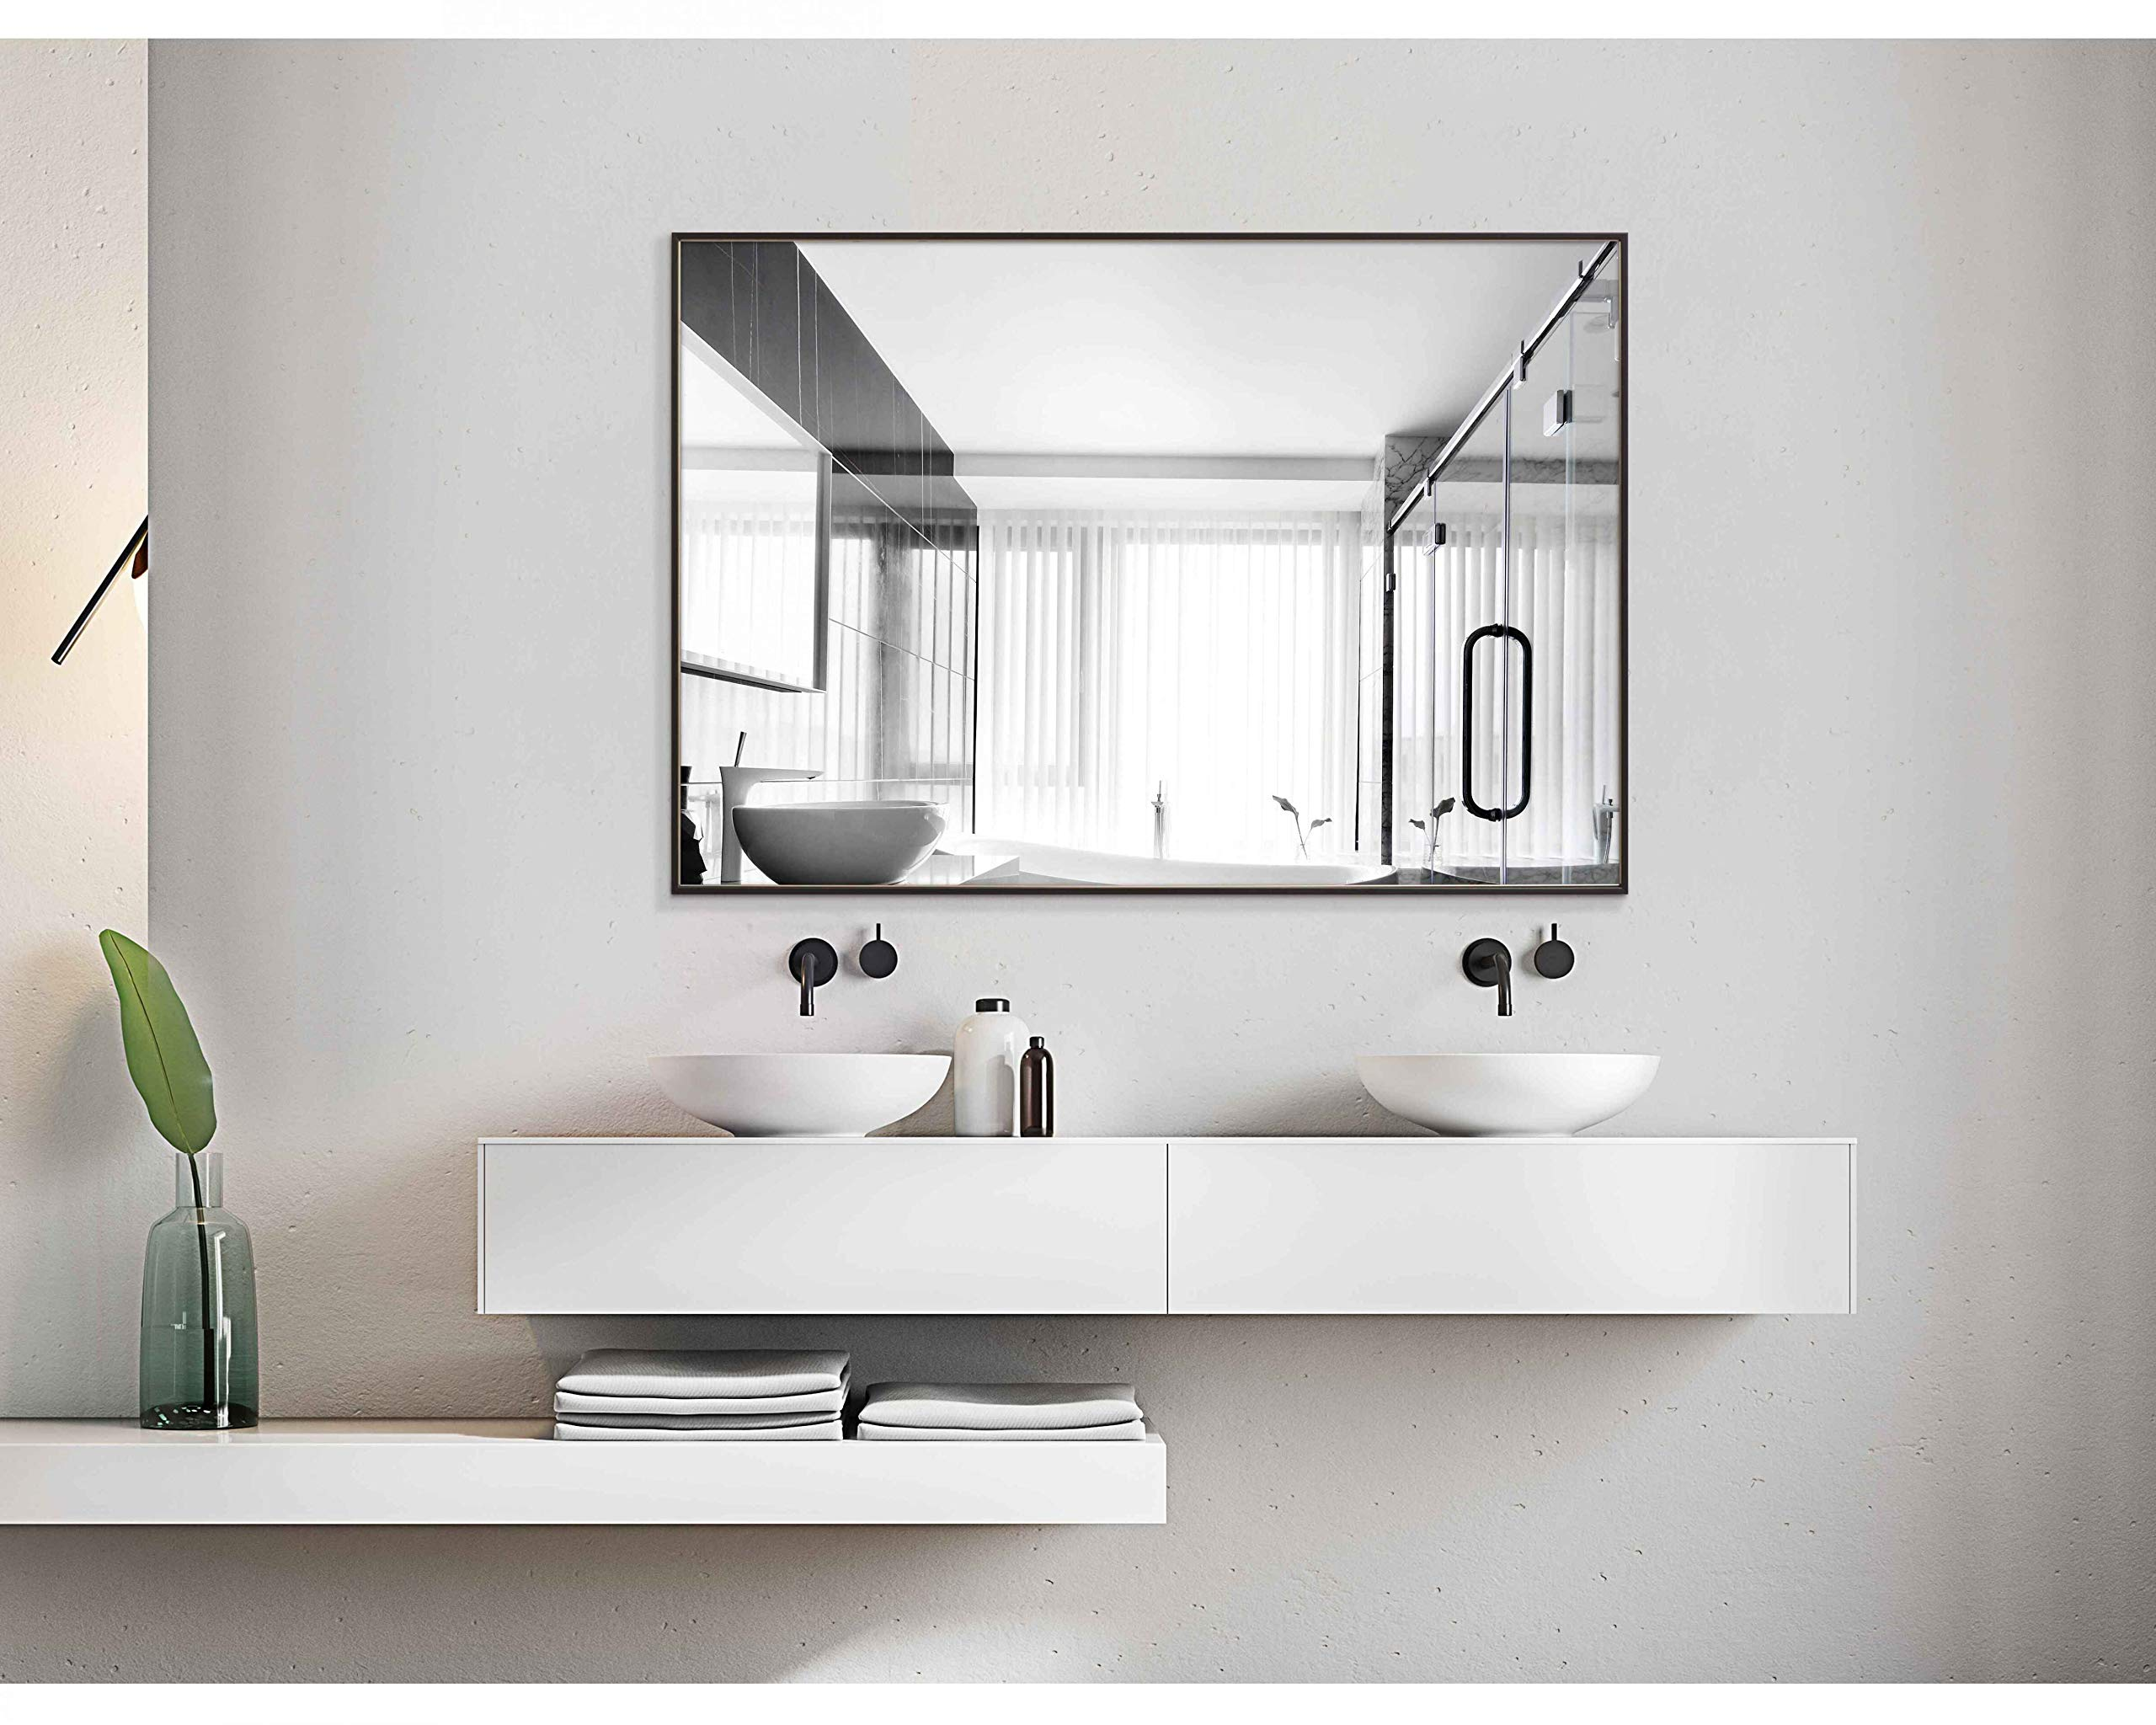 Hans&Alice Bathroom Mirrors Wall Mounted, Modern Black Frame Mirror for Bathroom, Bedroom, Living Room Hanging Horizontal or Vertical Commercial Grade 90+ CRI (32'' x 24'')